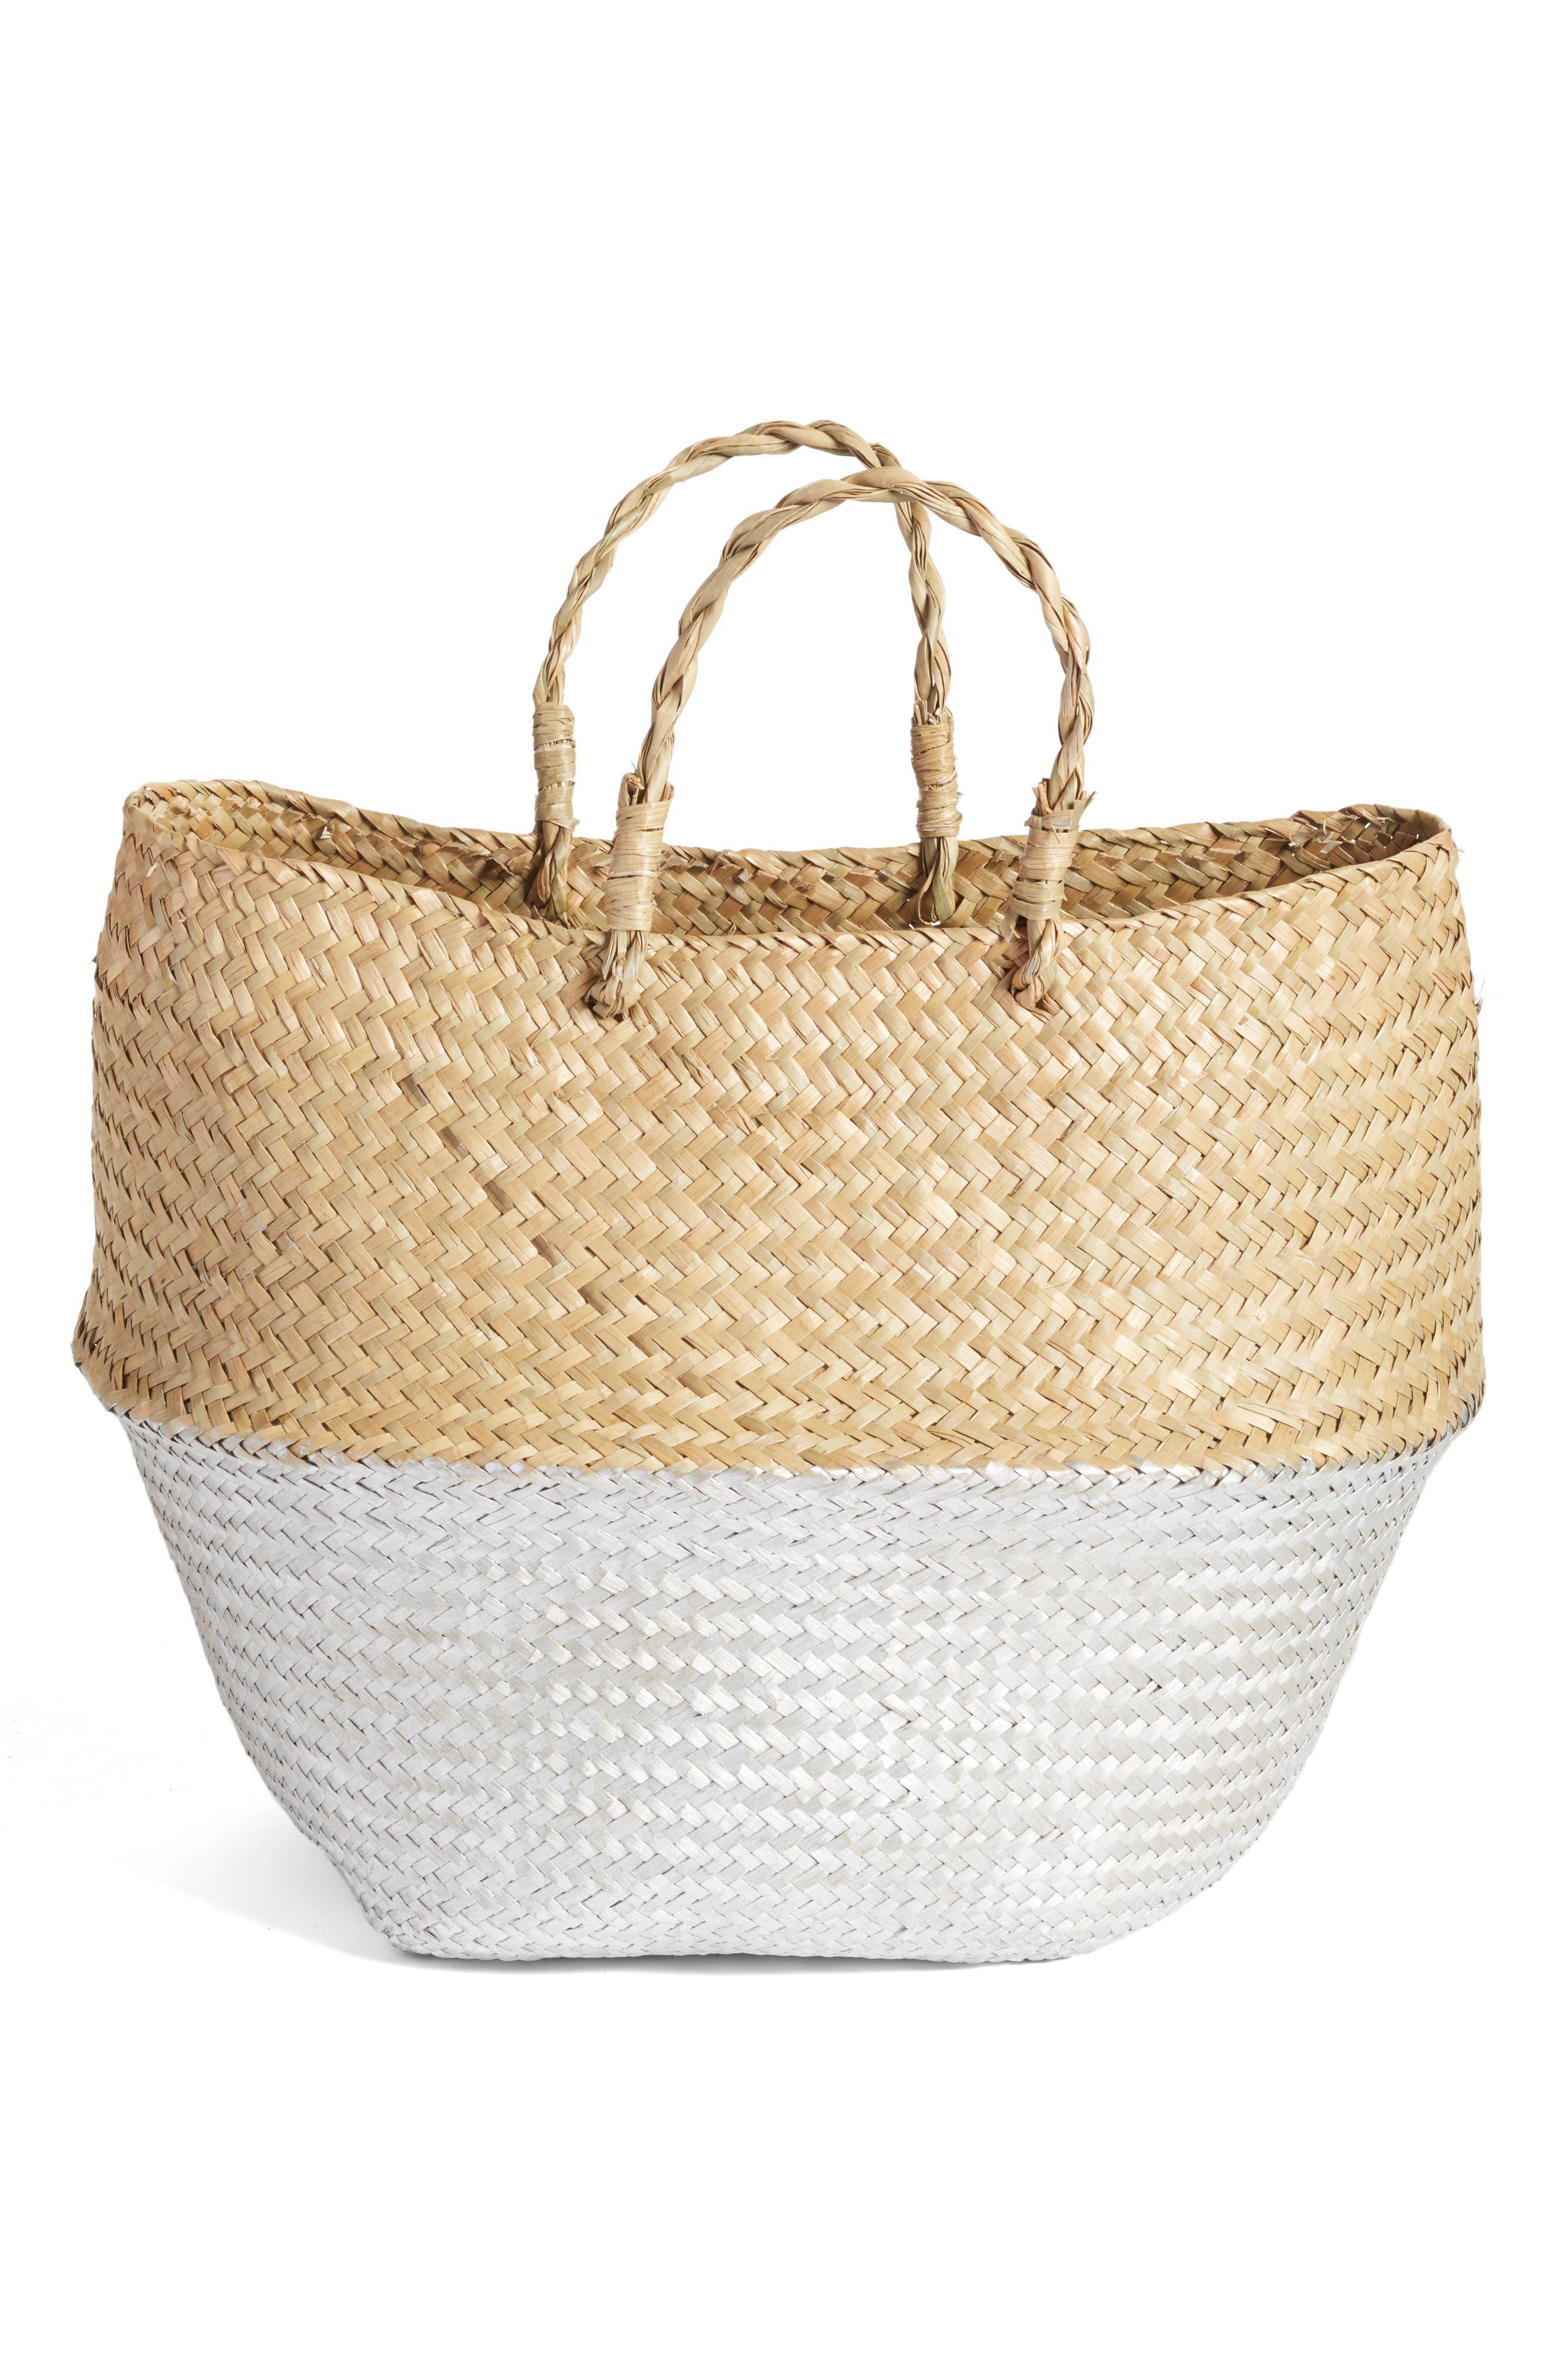 Two-Tone Metallic Straw Basket, Main, color, 040